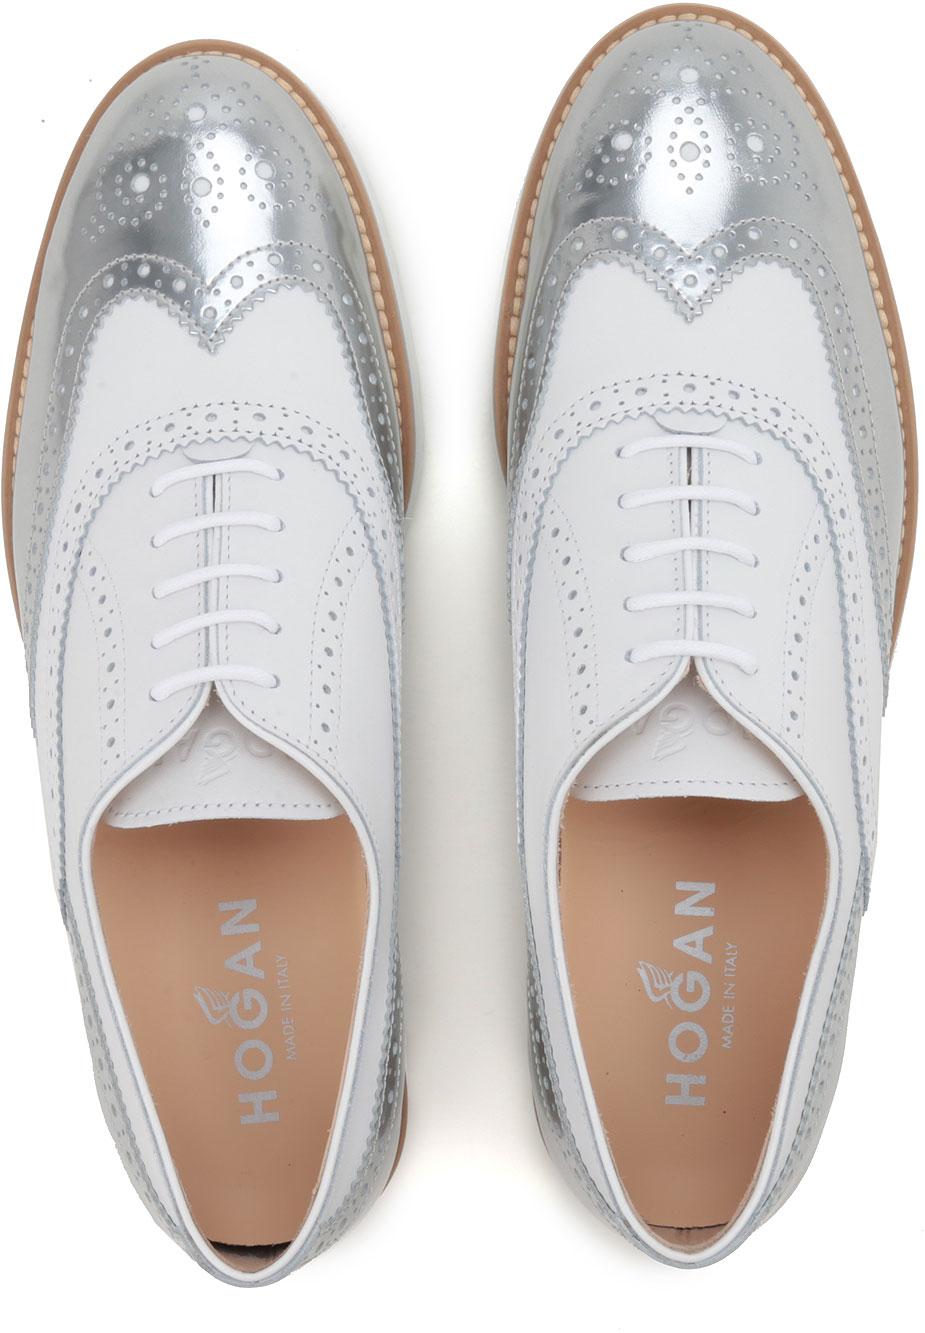 chaussures femme hogan code produit hxw2590r3208li0351. Black Bedroom Furniture Sets. Home Design Ideas